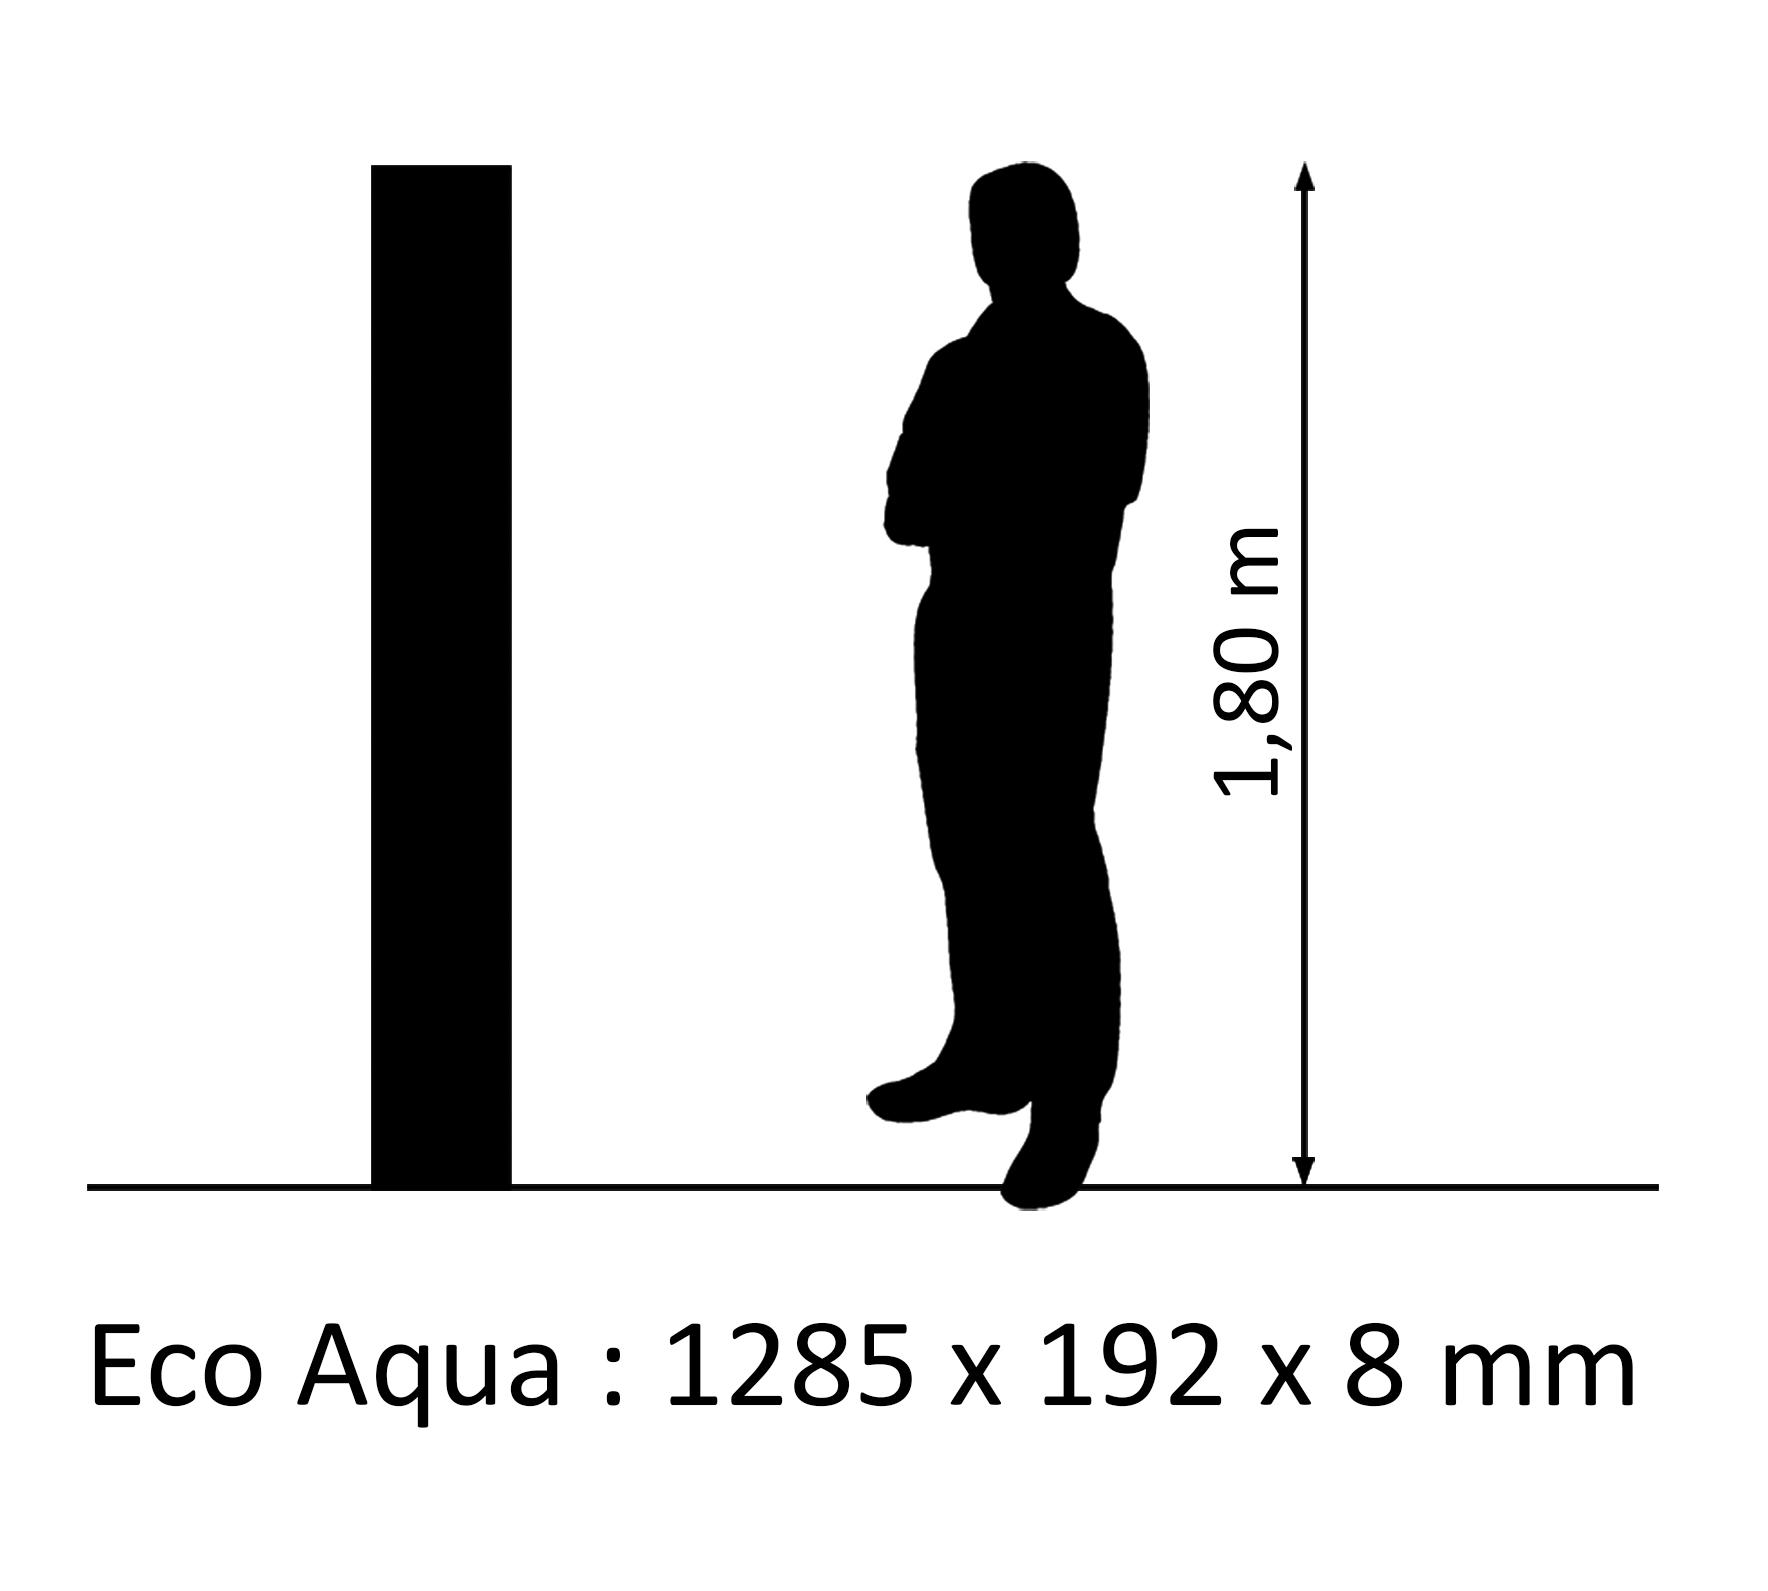 Wiparquet Eco Aqua Woodvale Laminatboden